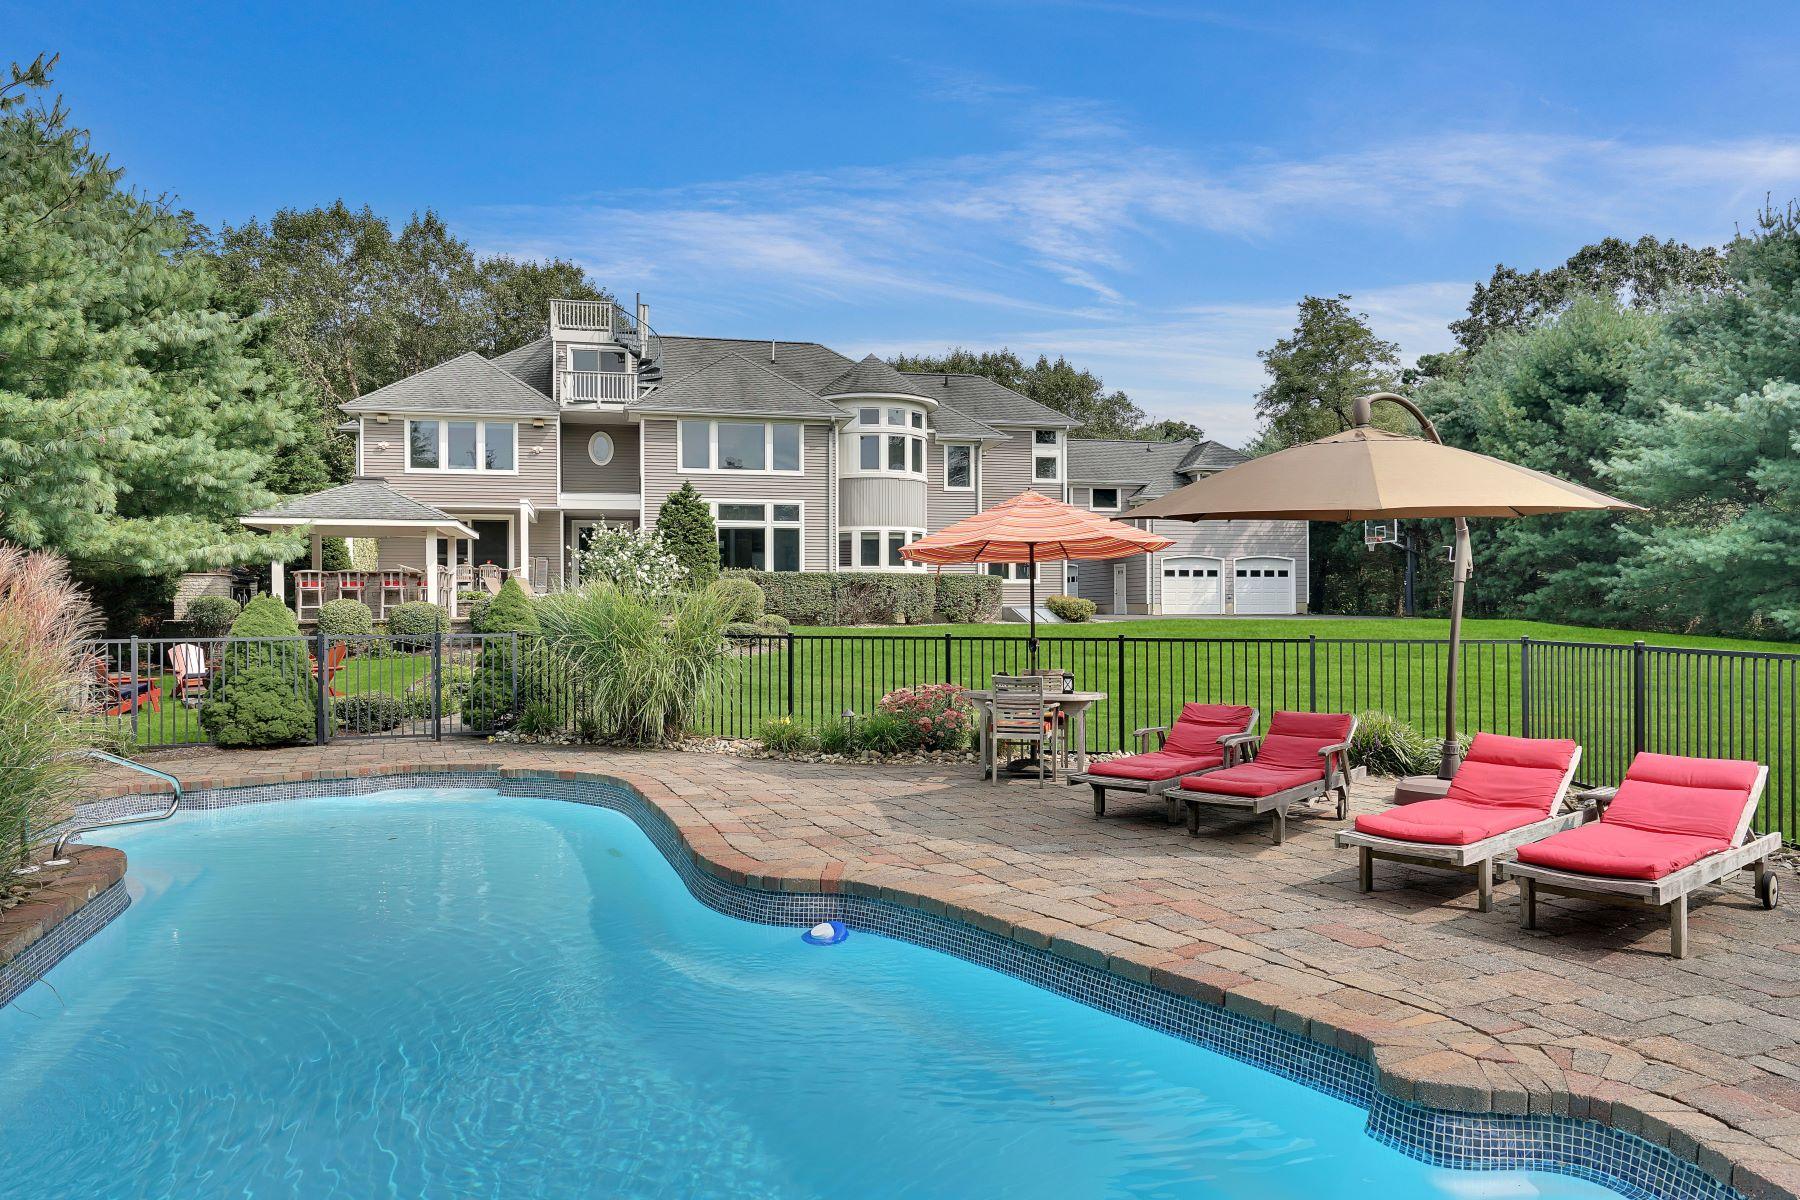 Single Family Homes pour l Vente à Stunning Custom Home 2511 Ramshorn Drive, Wall, New Jersey 08736 États-Unis